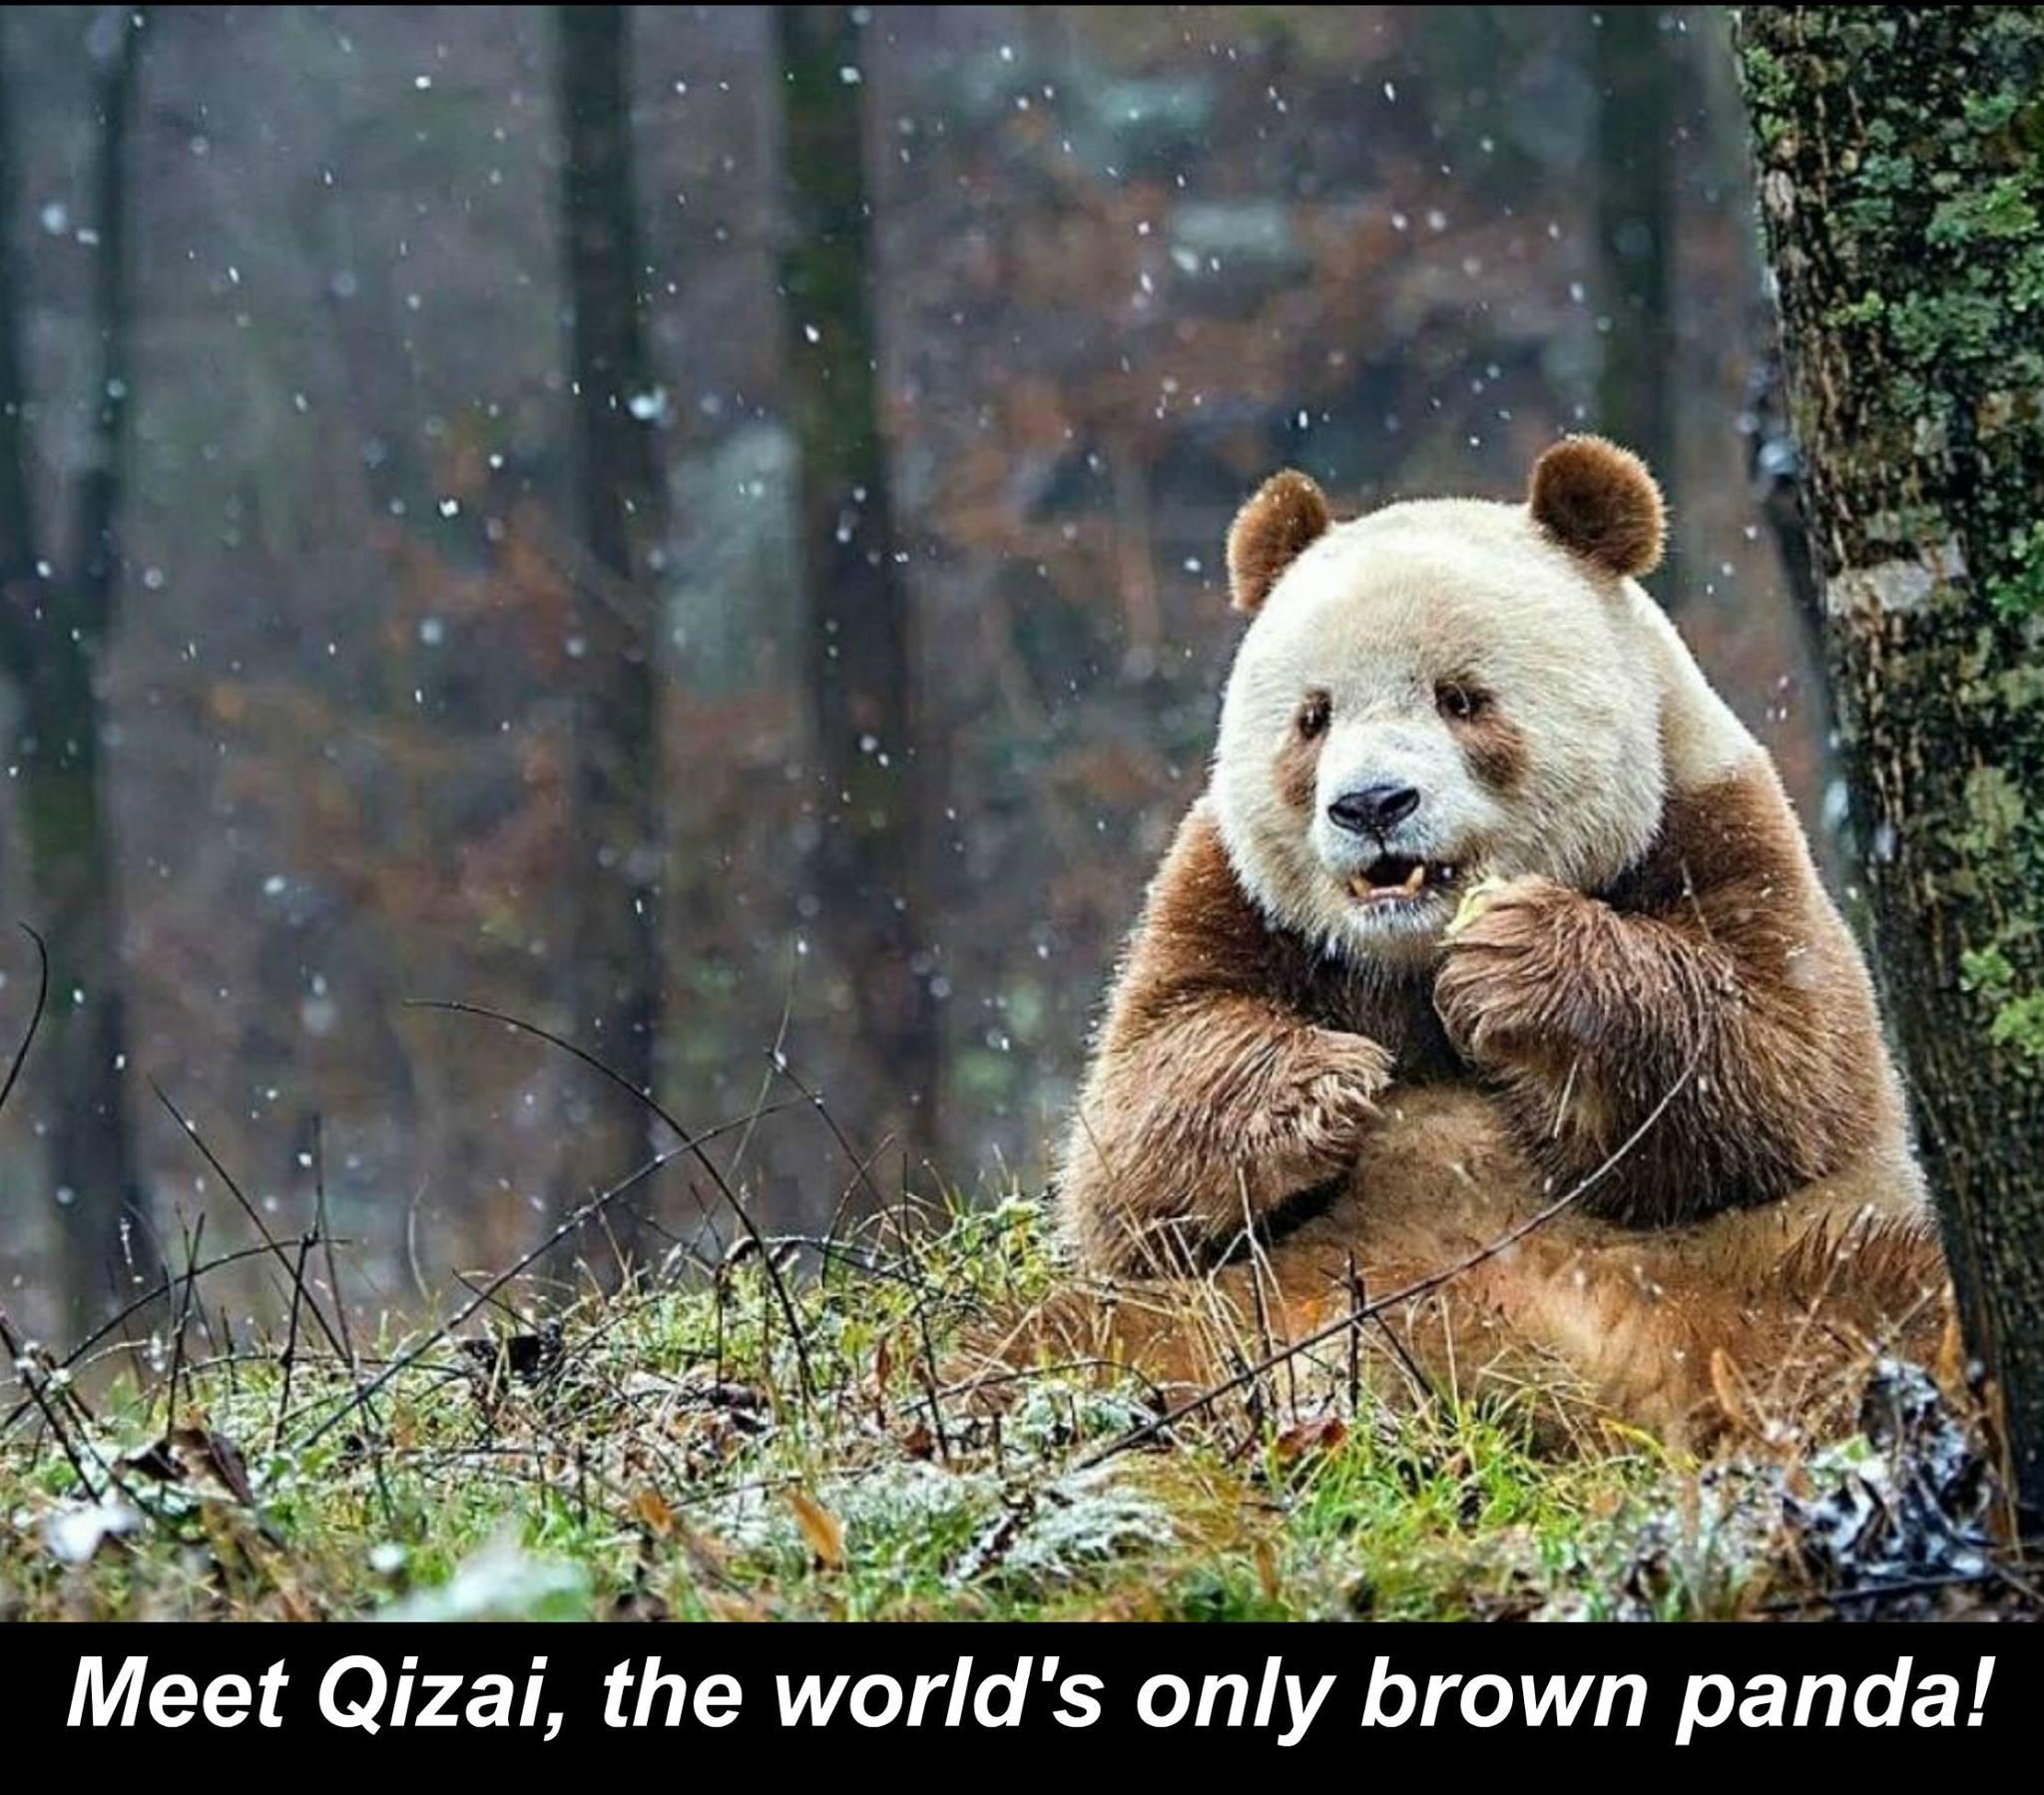 The only brown Panda: https://t.co/B6IBxkPX6N